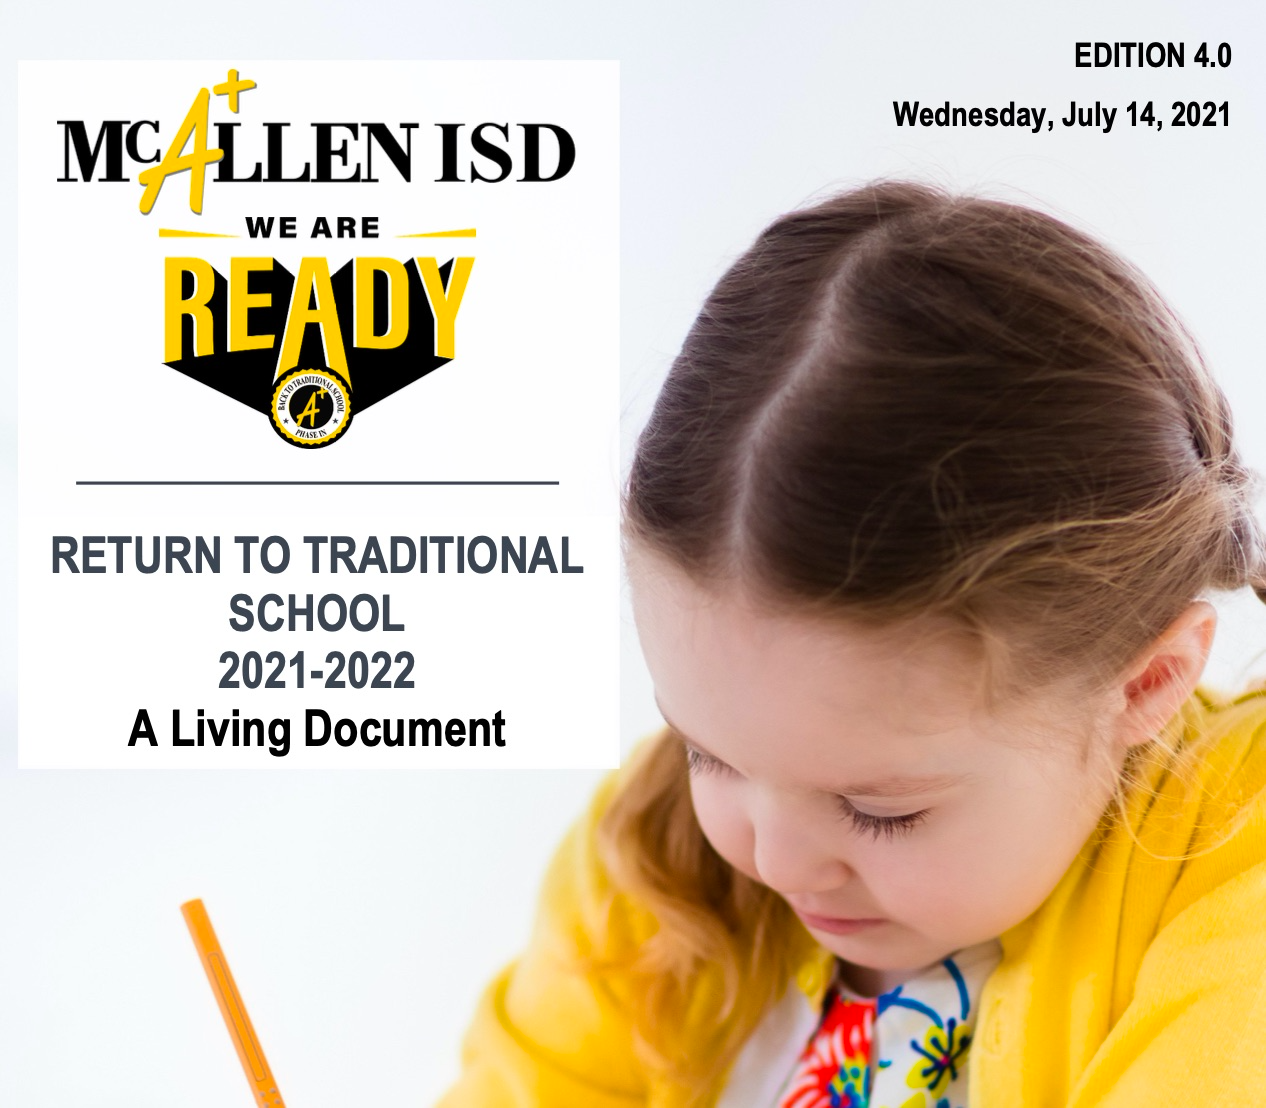 Return to Traditional School 2021-22